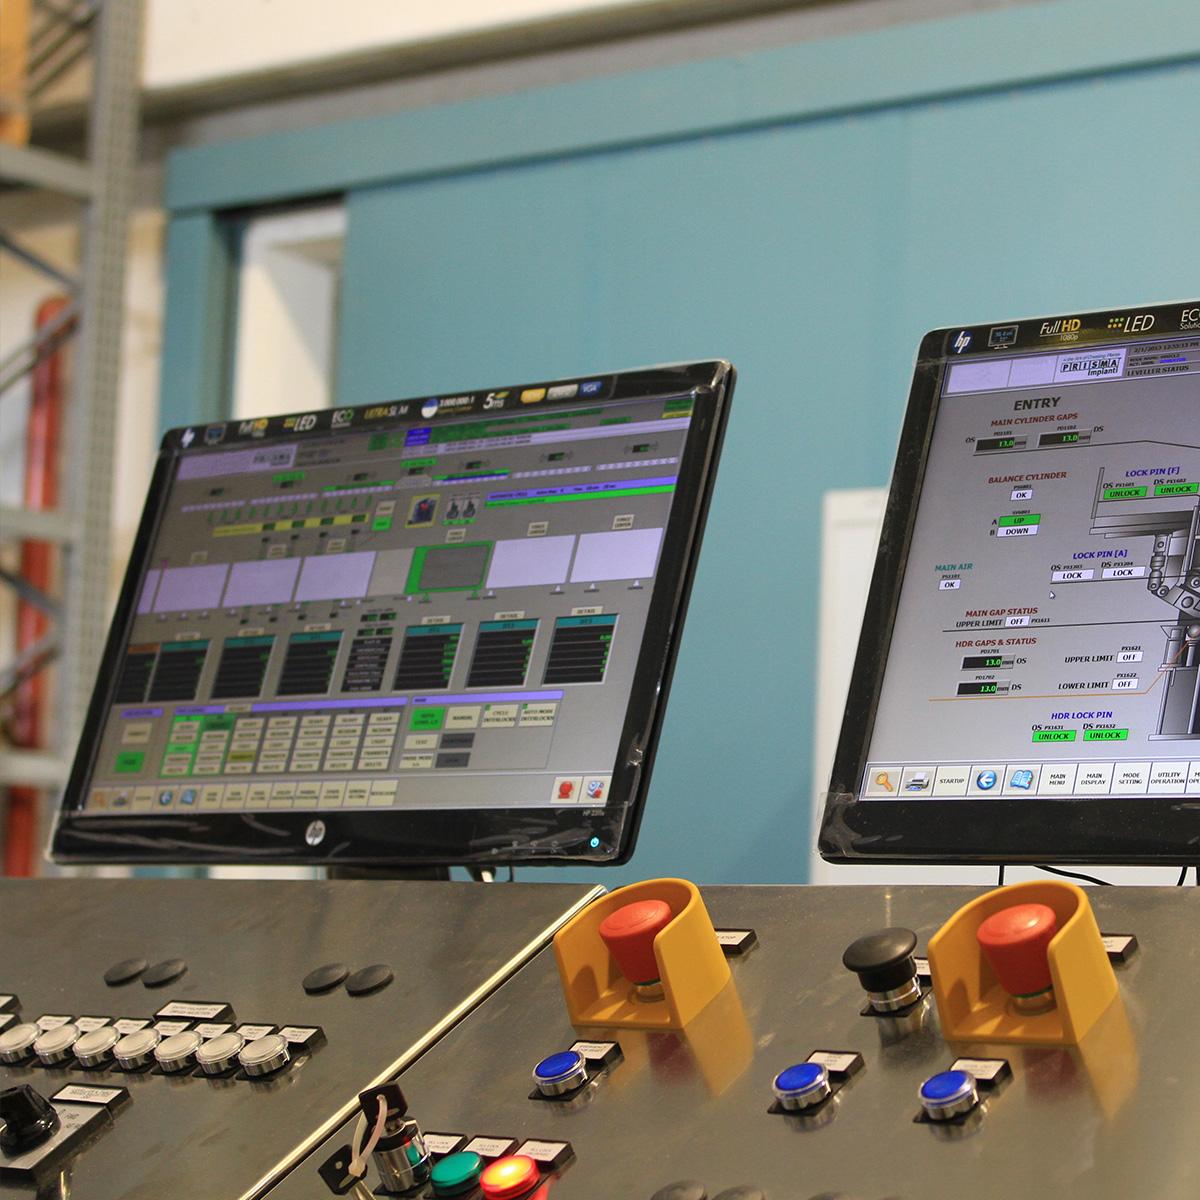 Productivity, Solutions, PRISMA Impianti, automazione, impiantistica, ingegneria